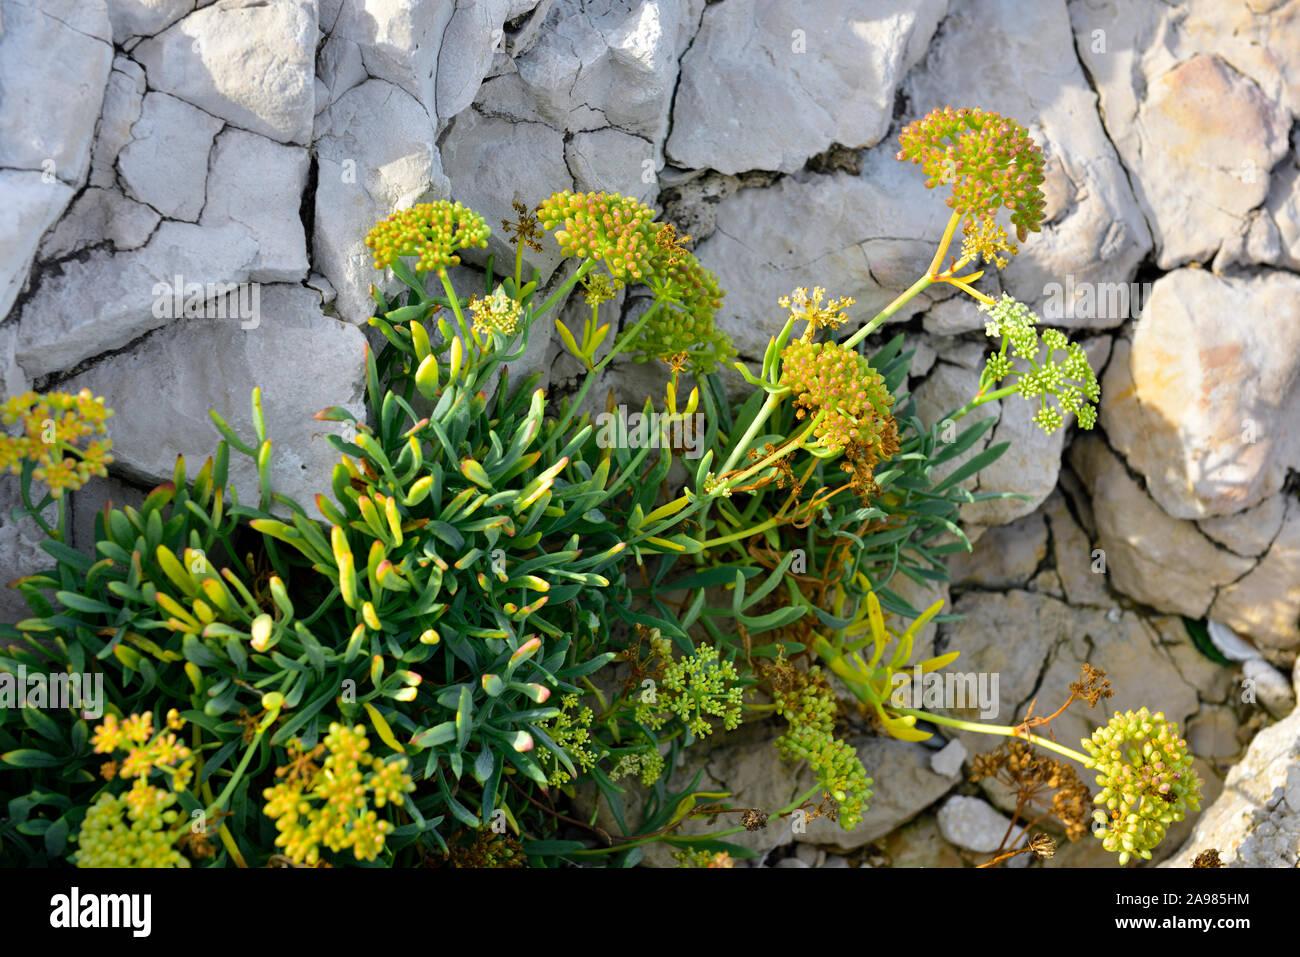 Samphire a flowering plant growing among the limestone rocks on foreshore of Adriatic sea, Croatia Stock Photo